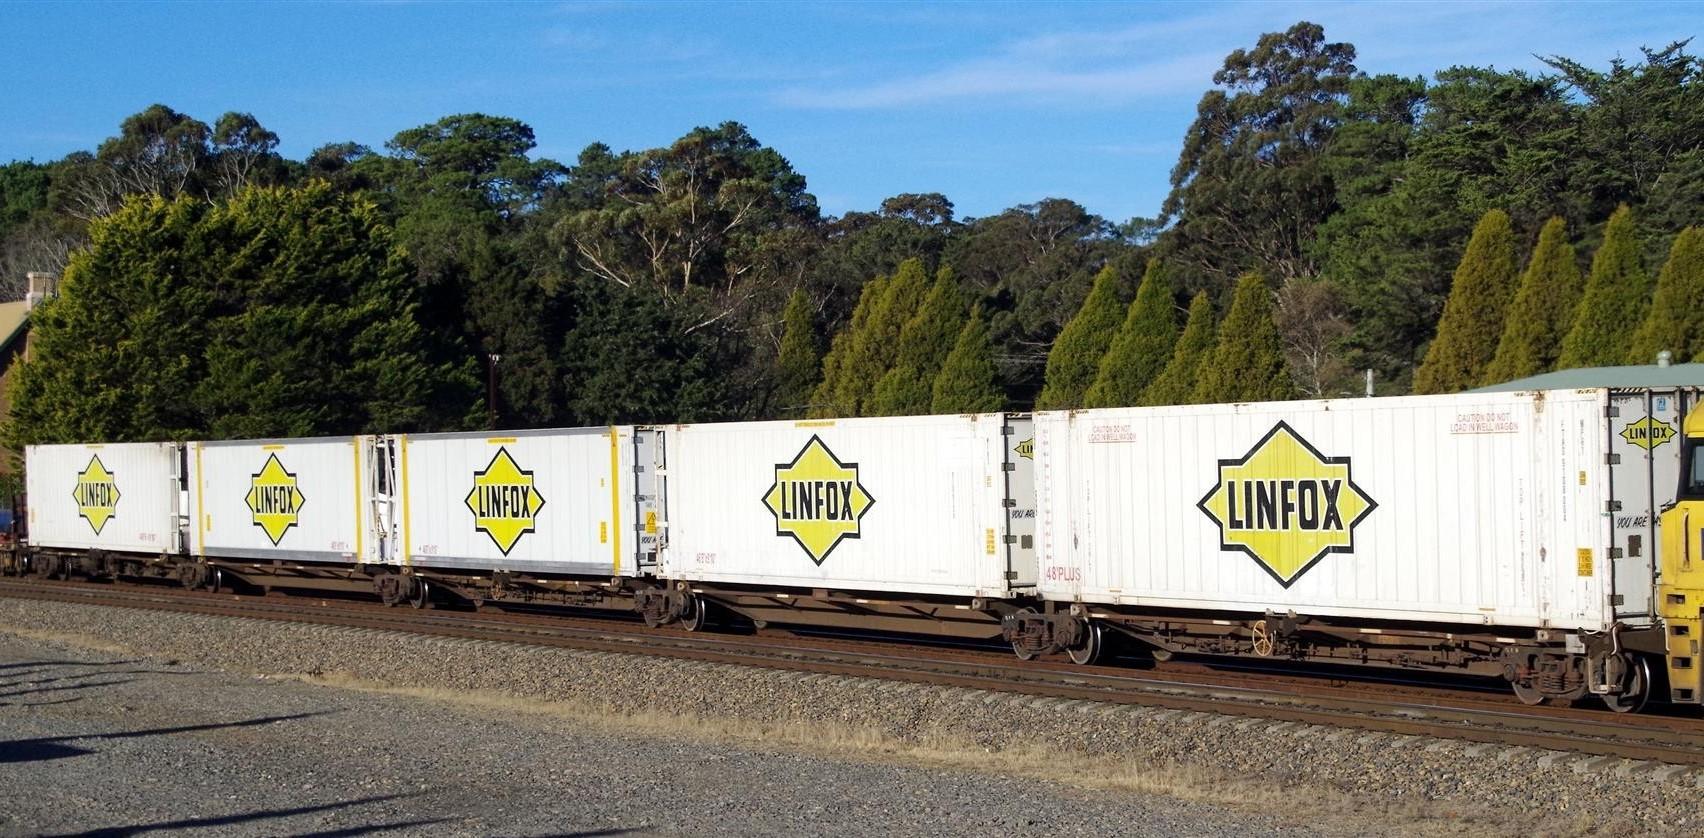 200000 Intermodal Containers